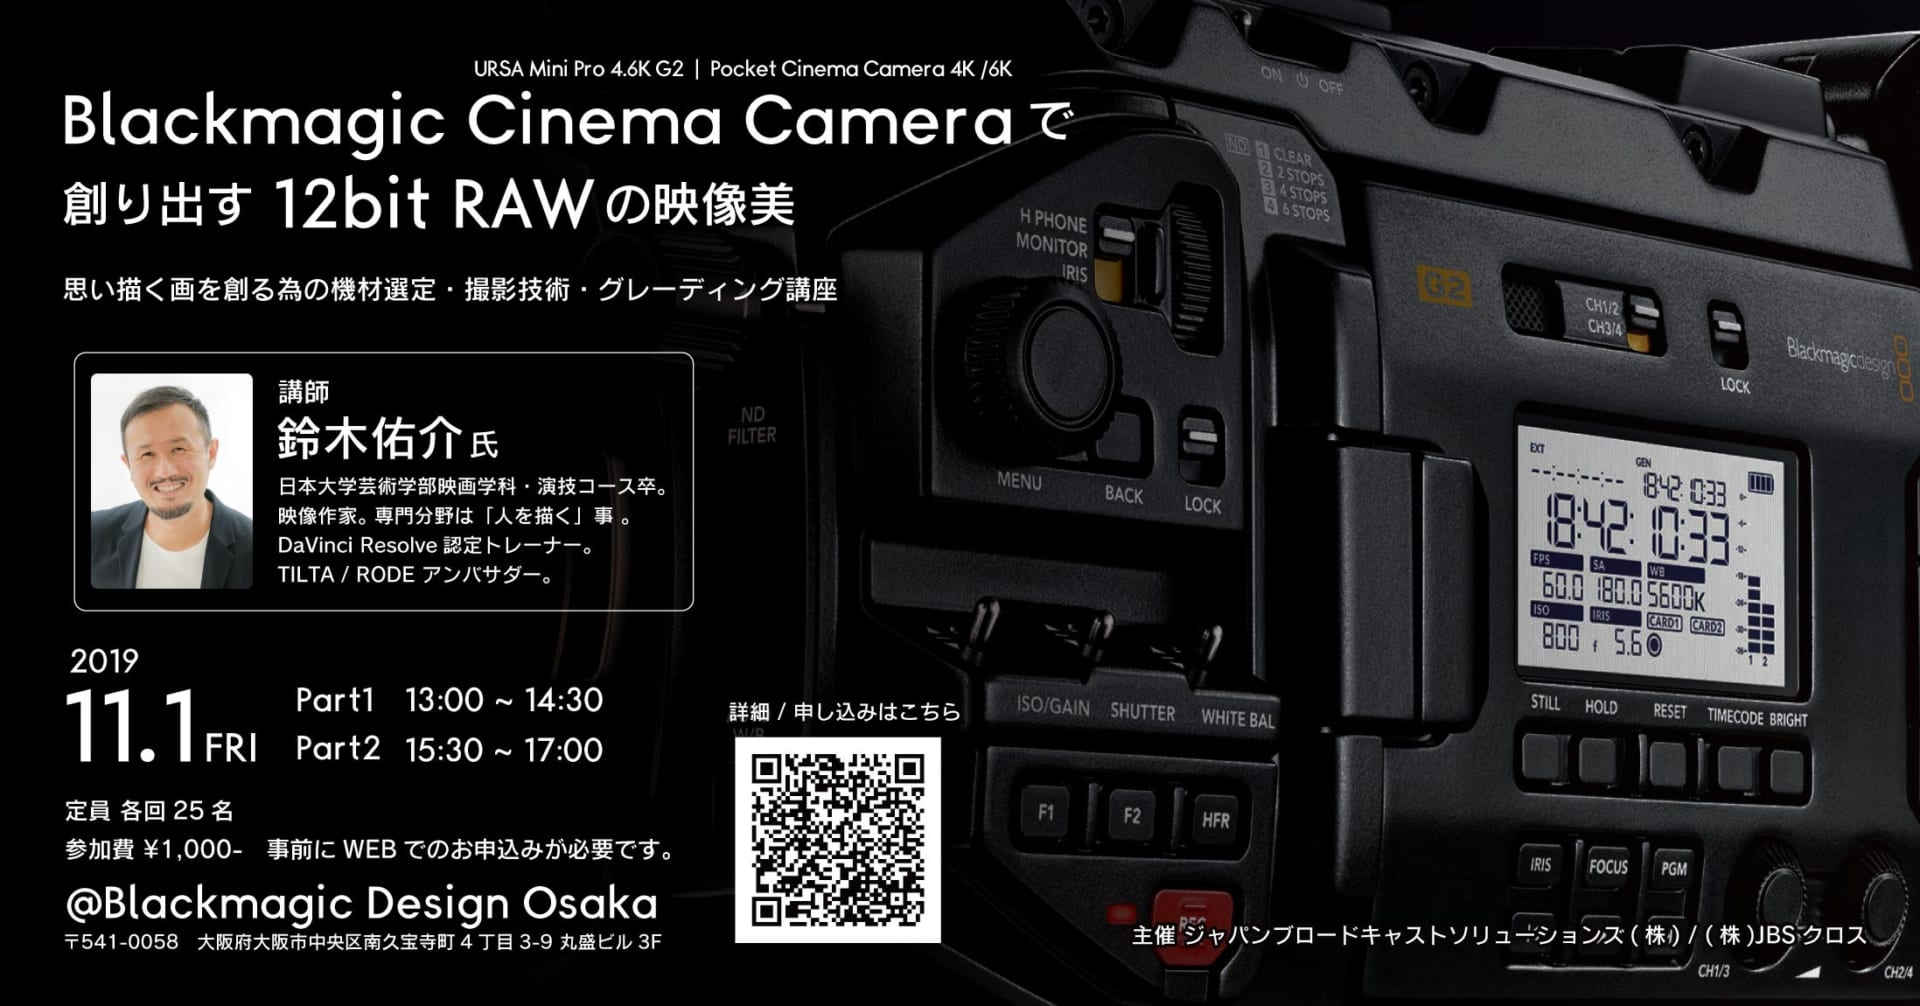 【EVENT】11月1日(金) Blackmagic Cinema Cameraで創り出す12bit RAWの映像美